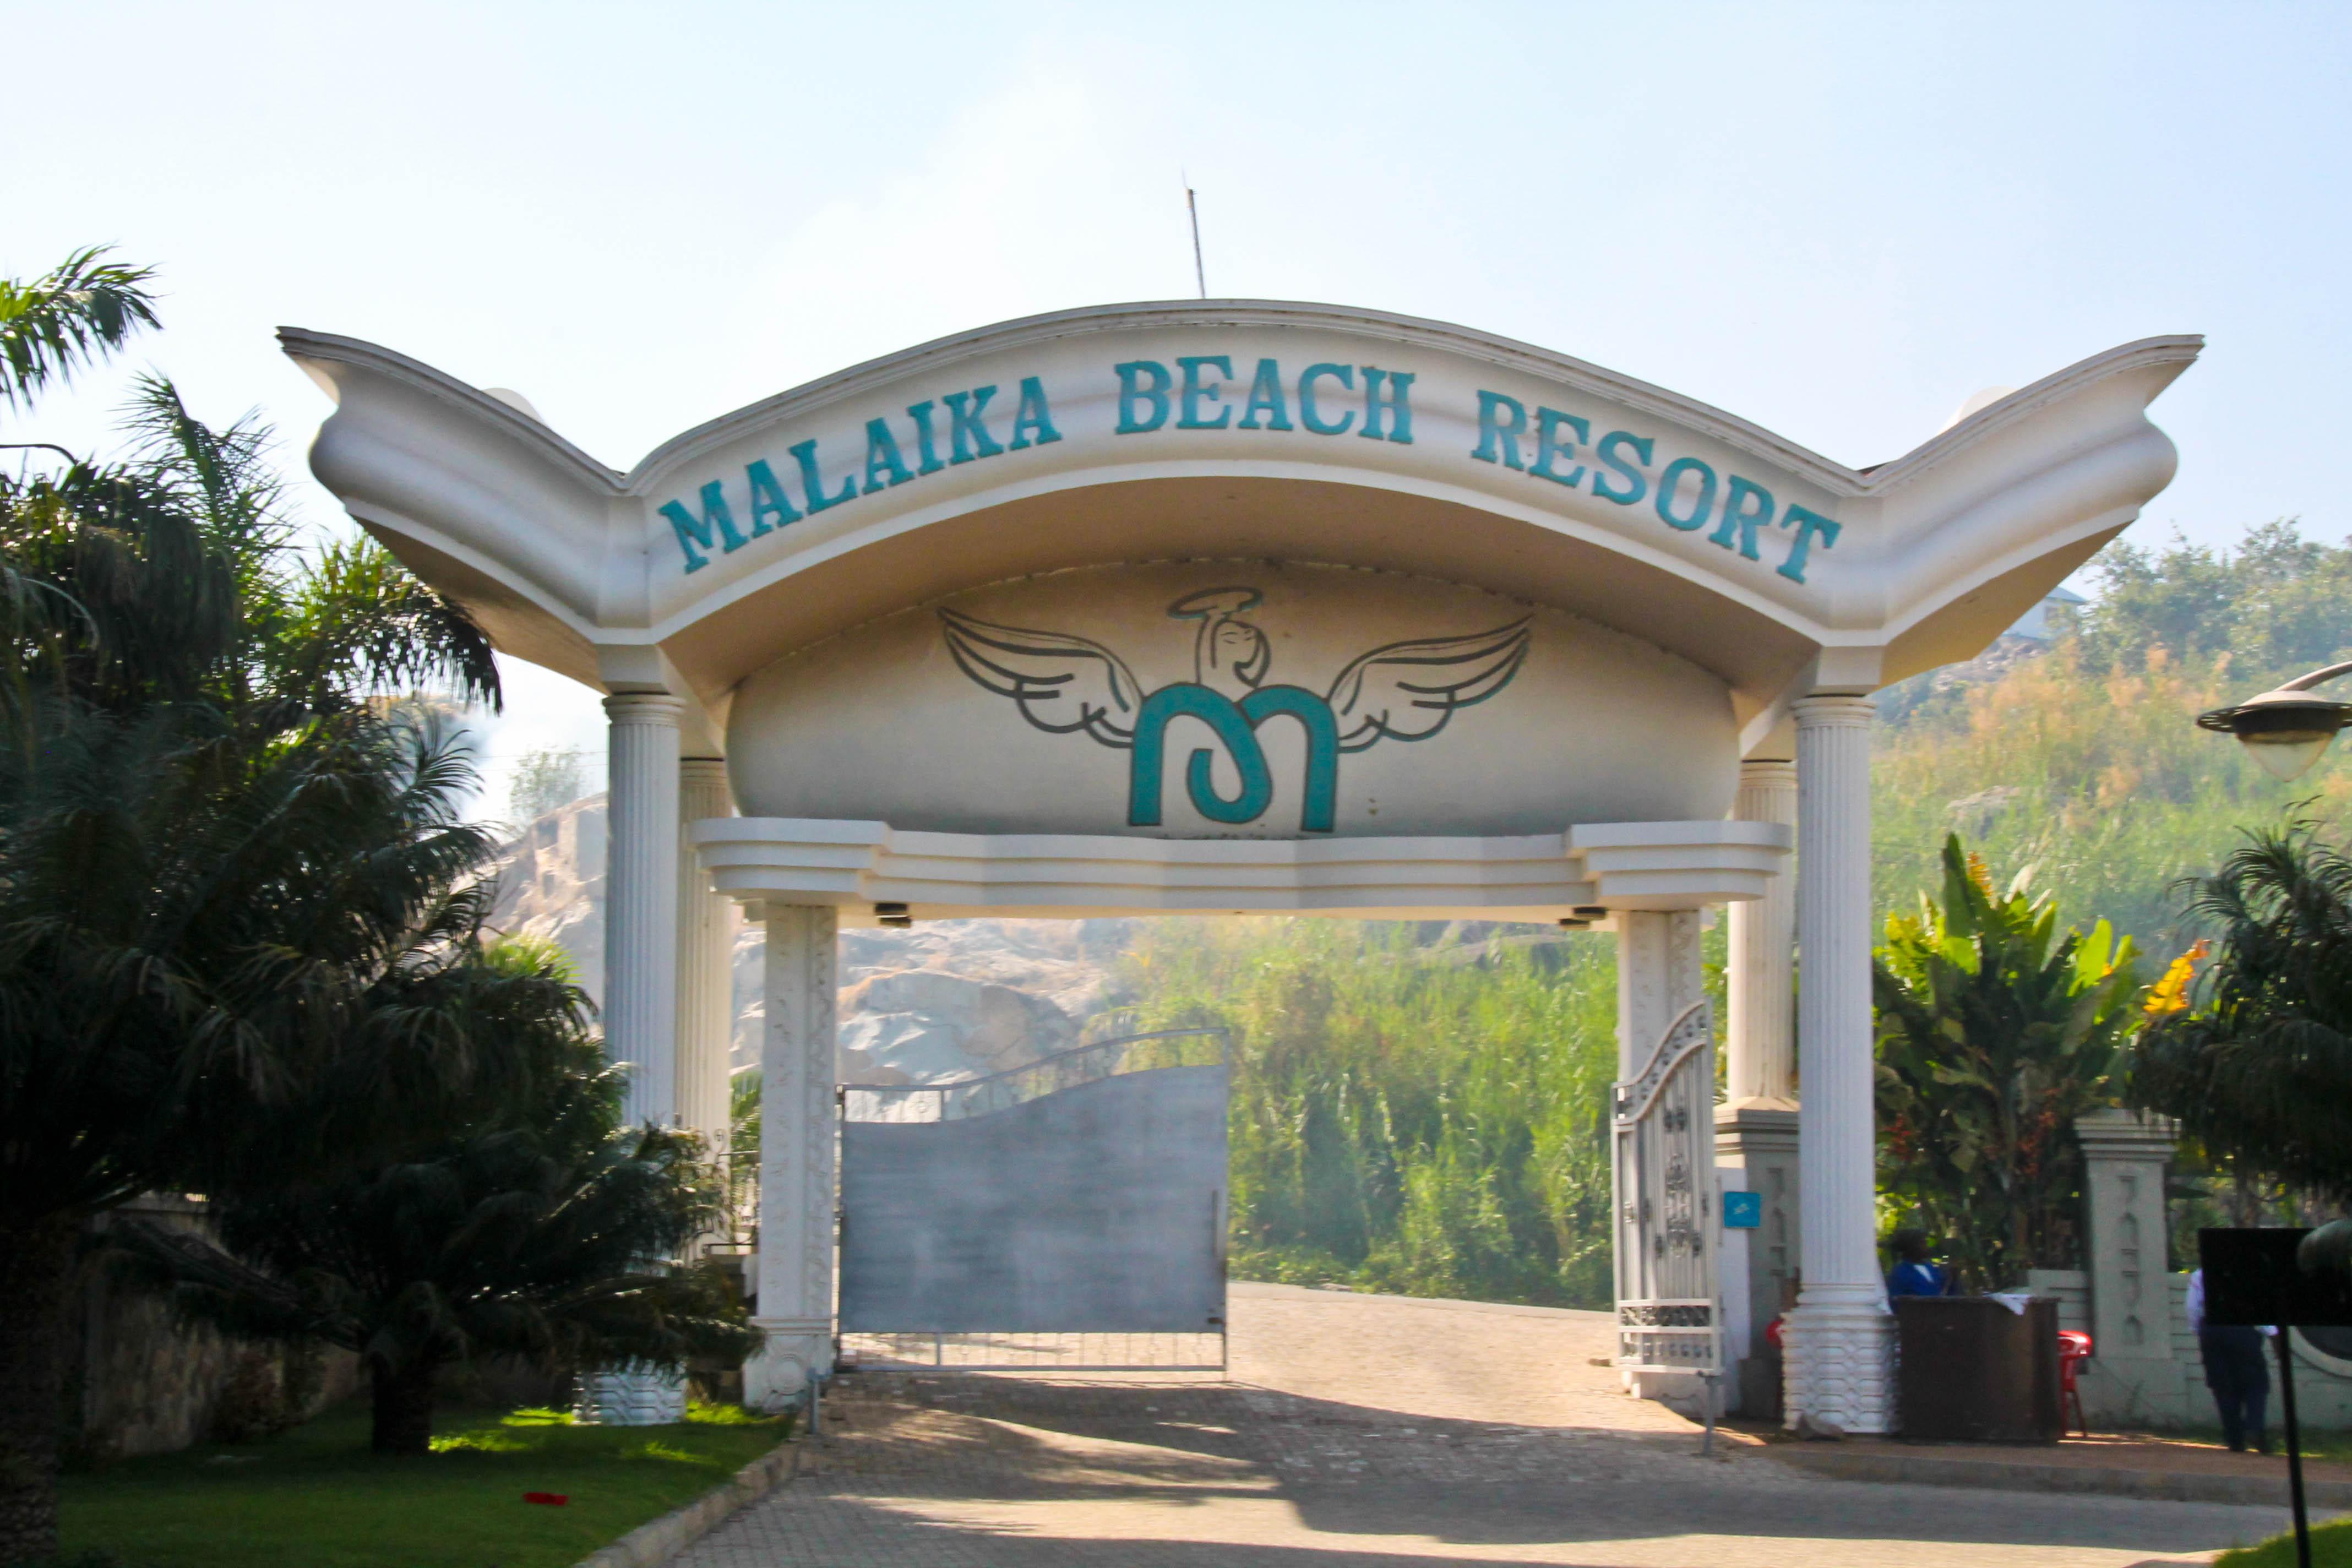 Malaika Beach Resort, Mwanza Tanzania